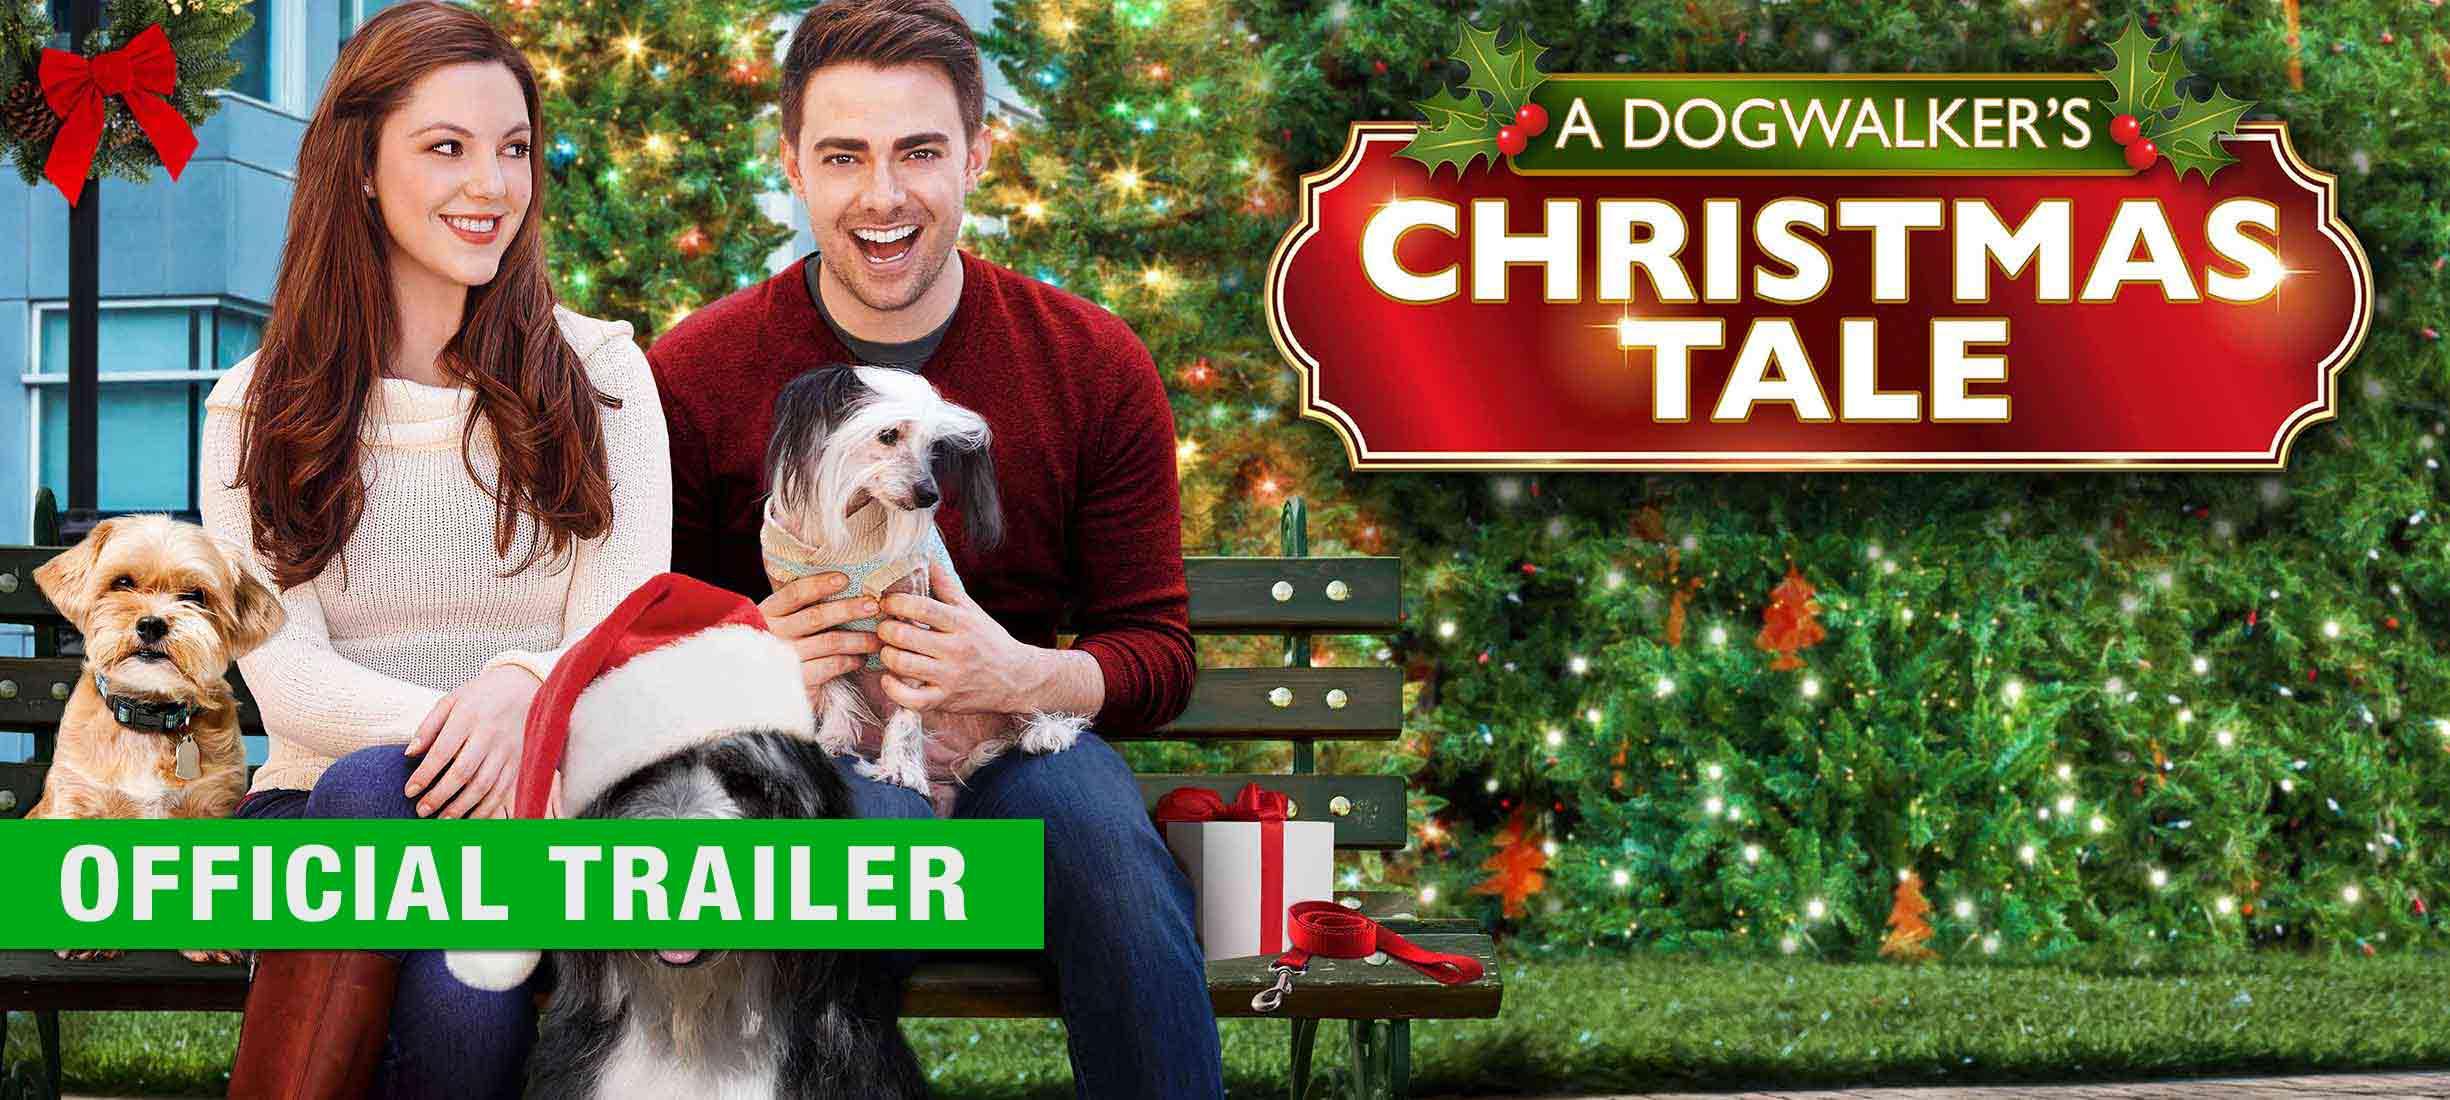 a dogwalkers christmas tale trailer - Christmas Tale